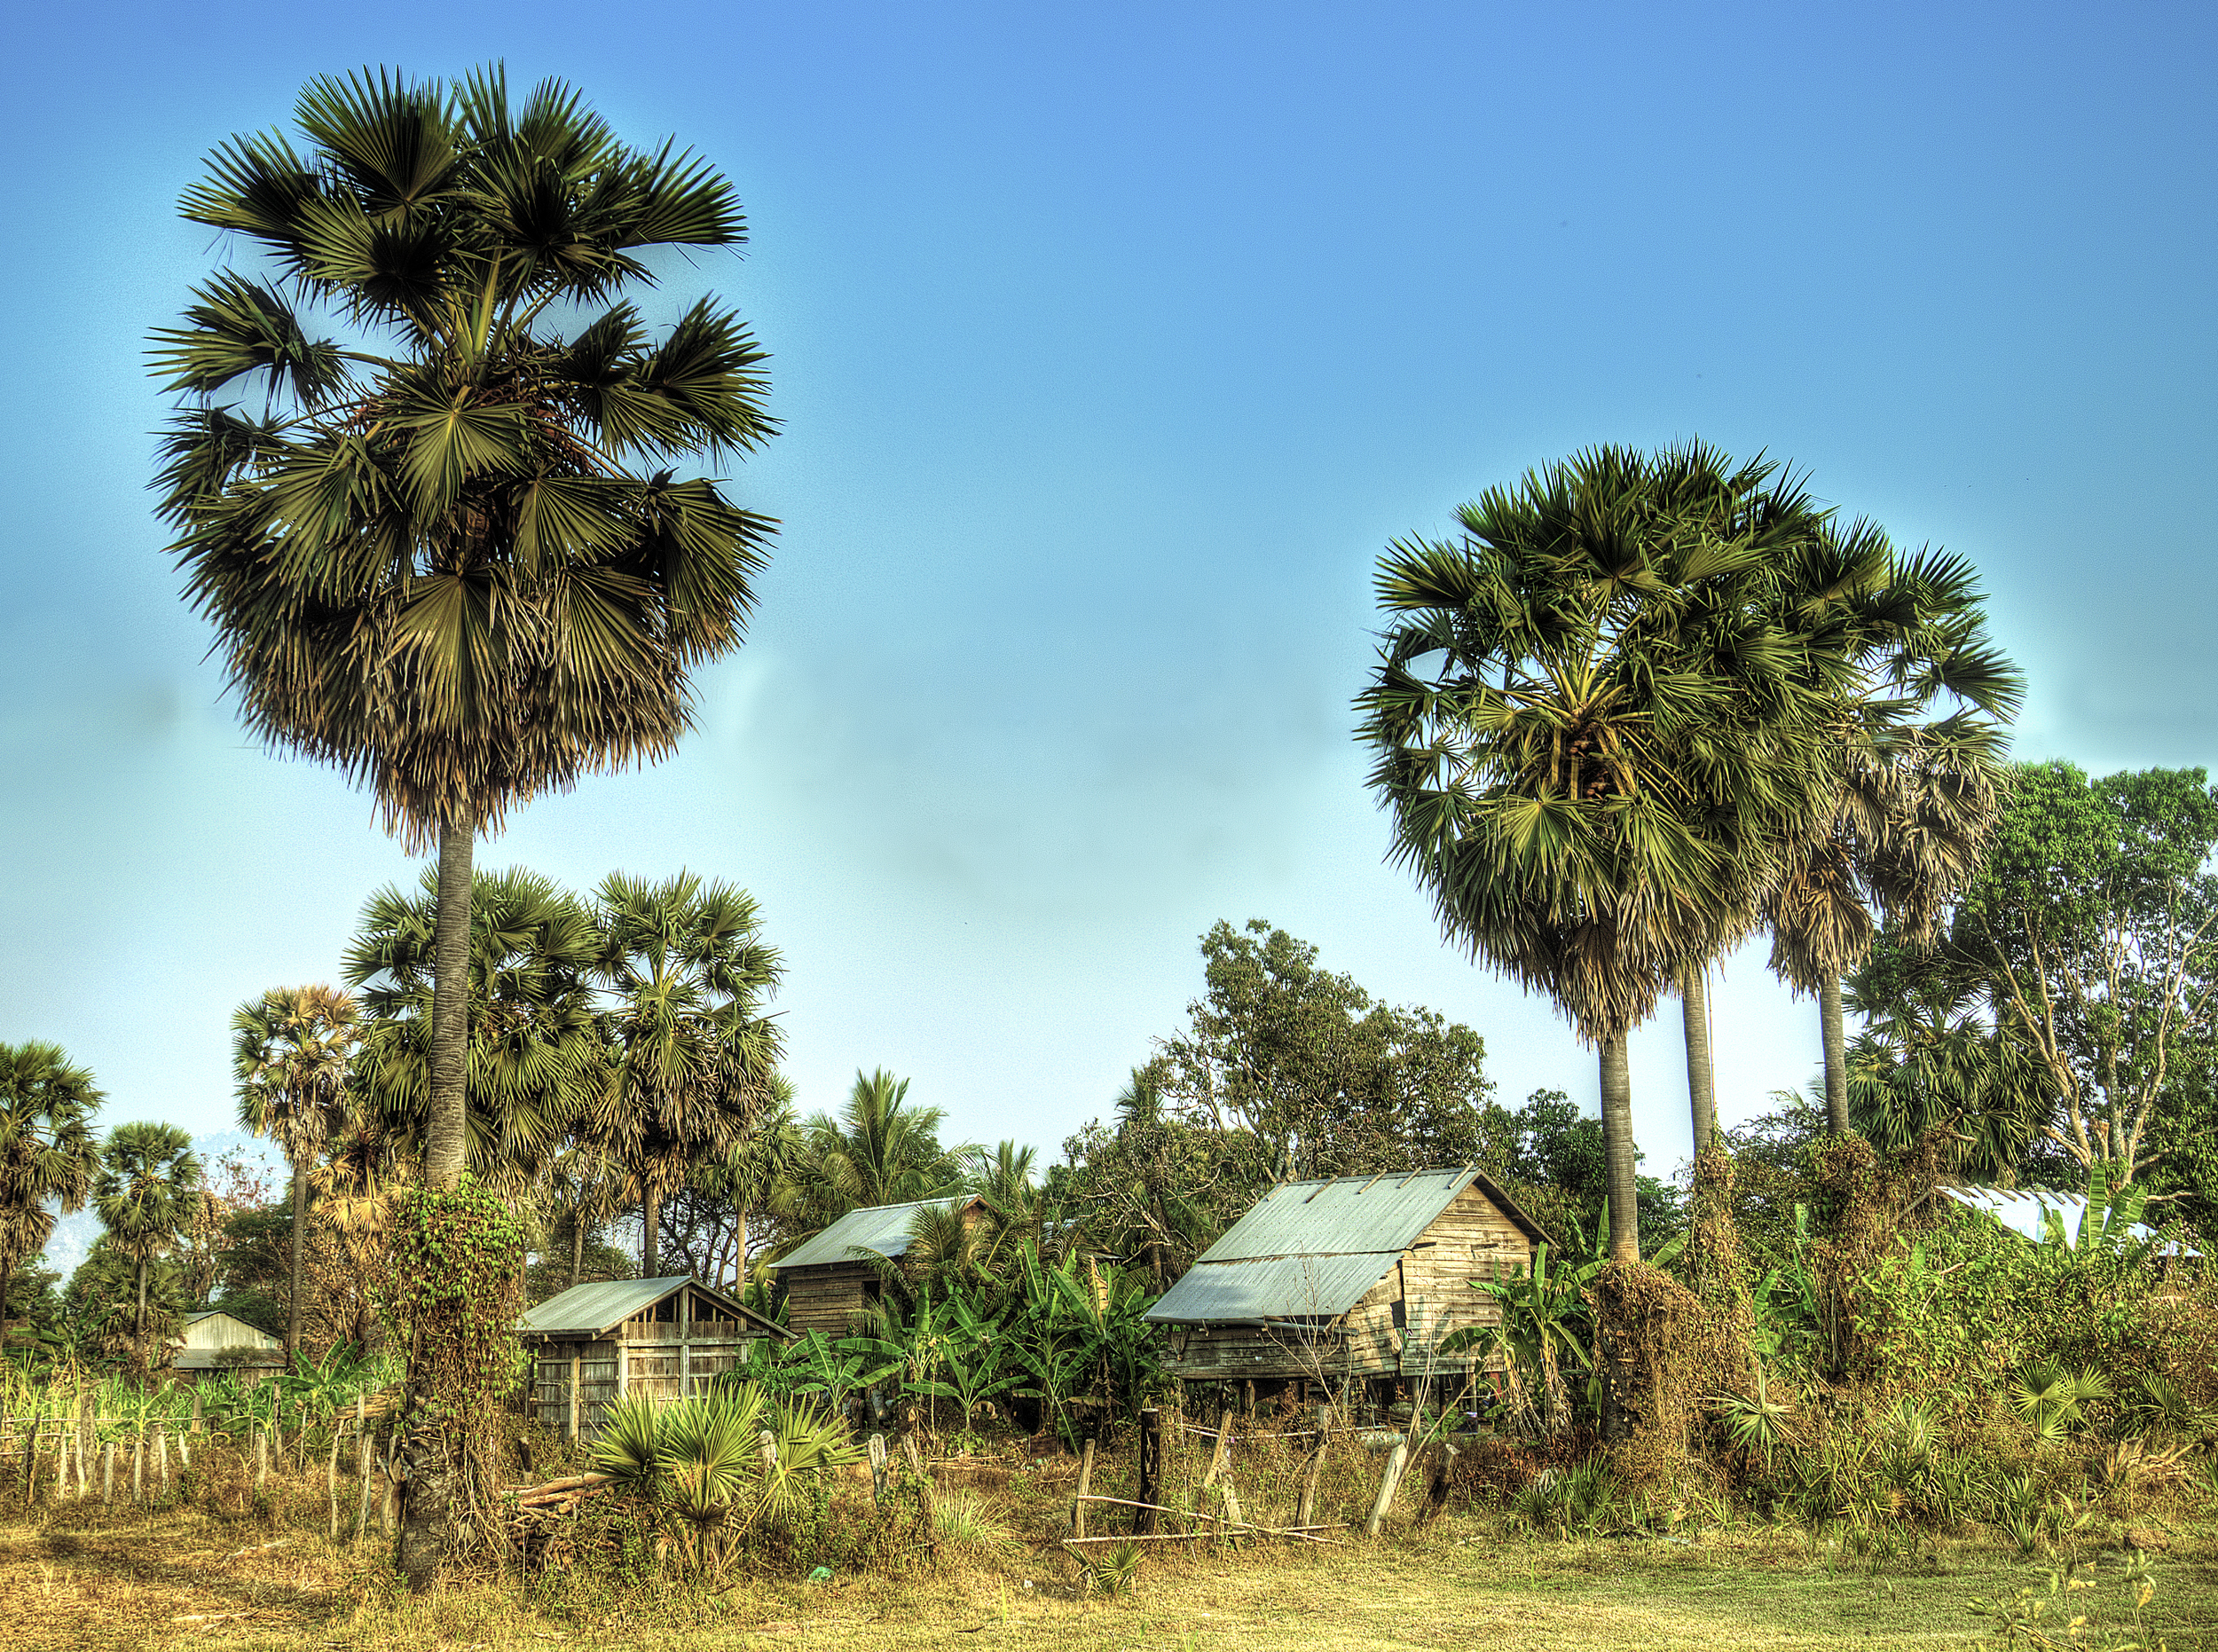 Cambodian Homestead